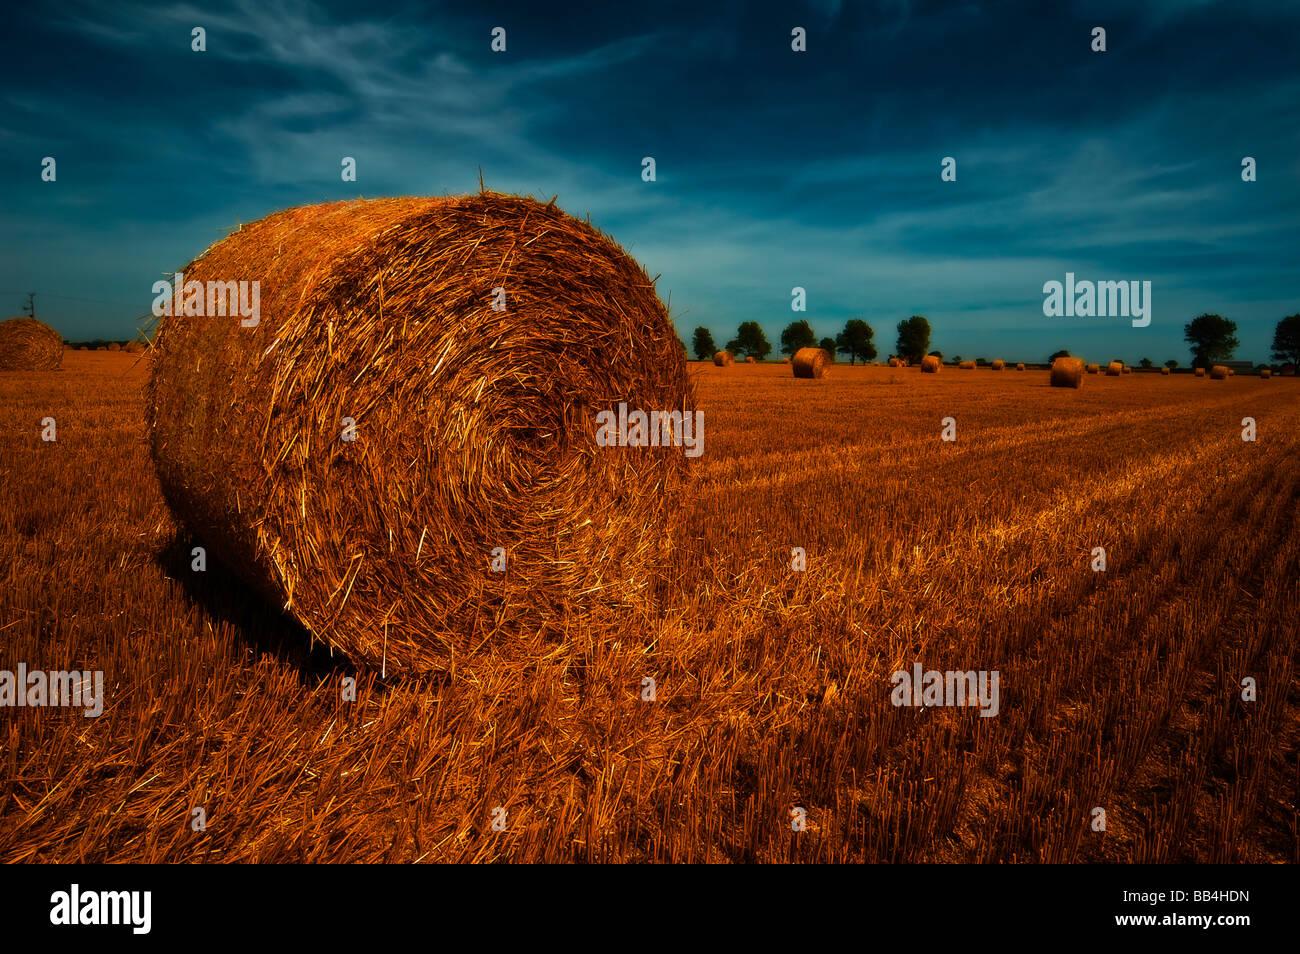 hay bail sunset england - Stock Image